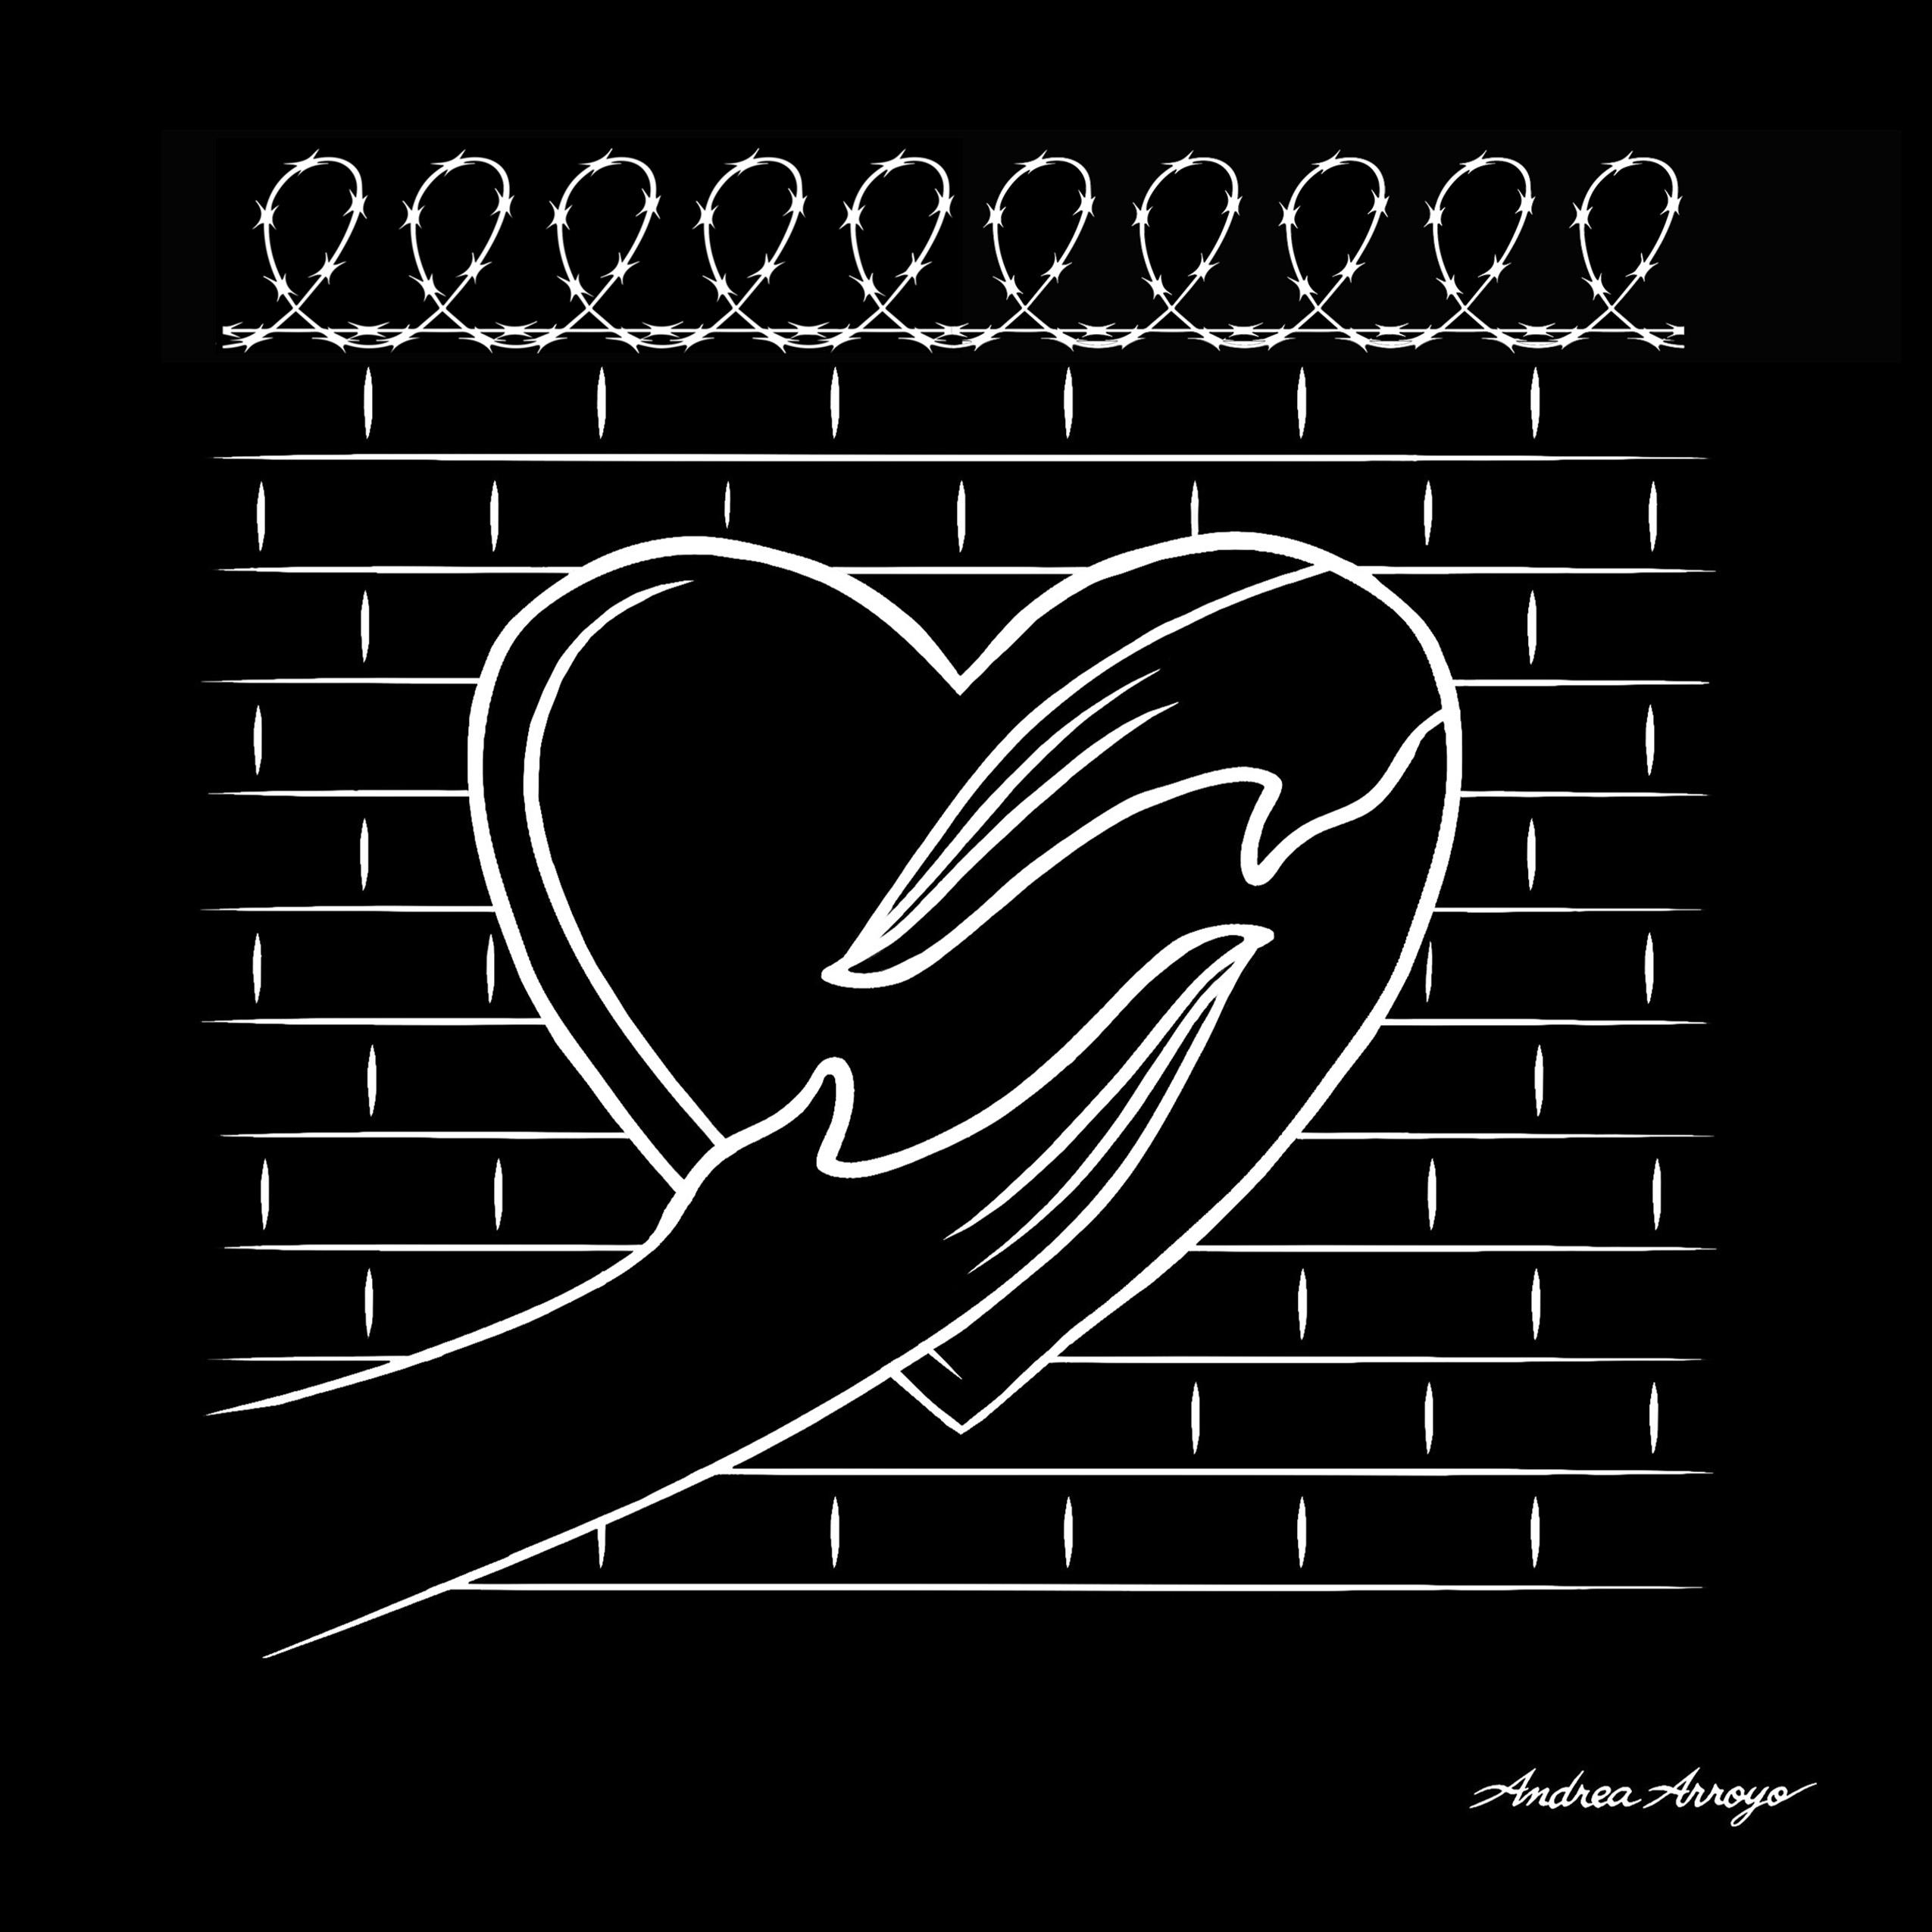 Love will break through walls